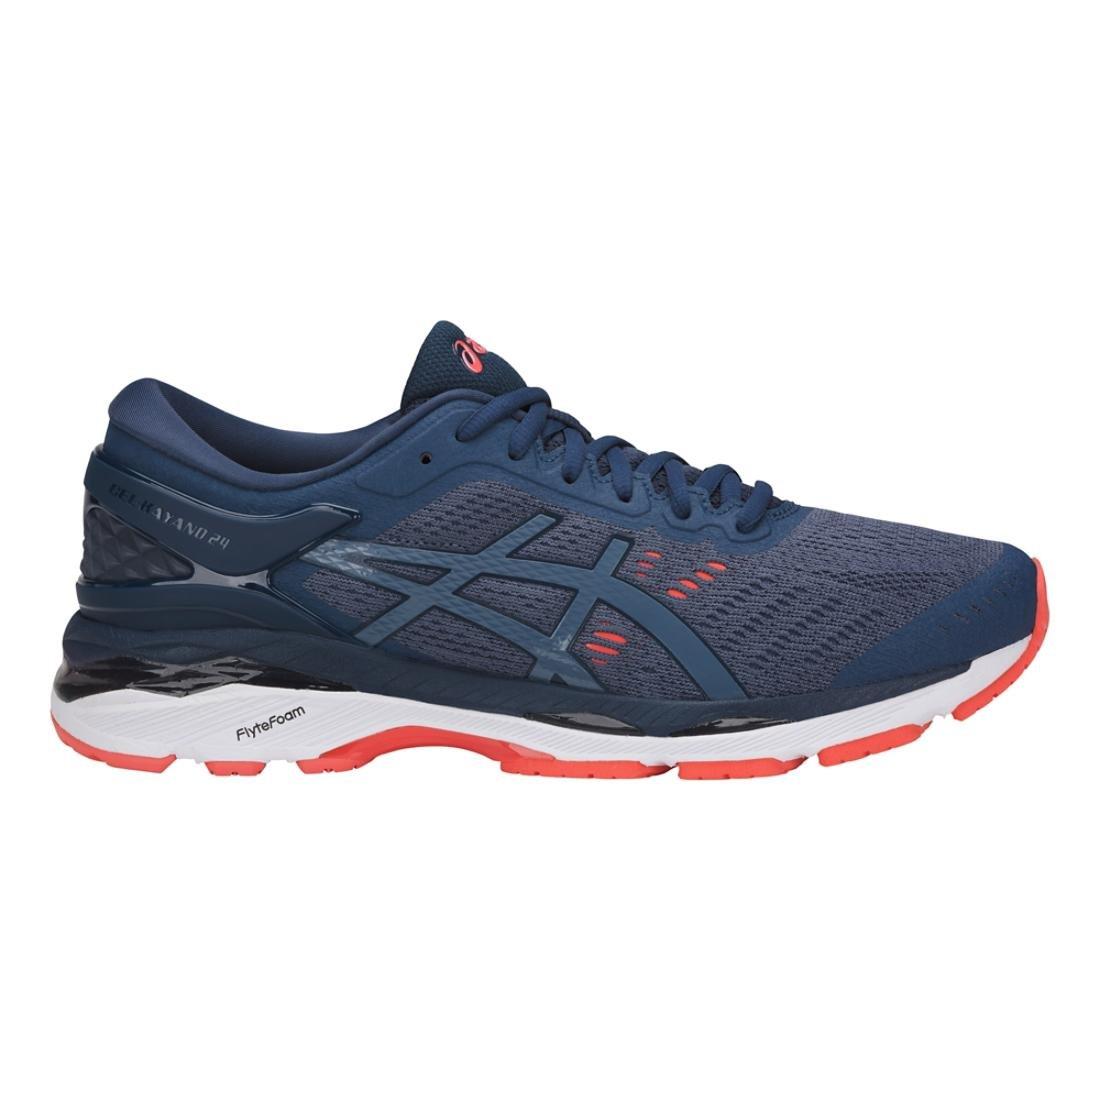 the latest 6a308 73427 ASICS Mens Gel-Kayano 24 Running Shoe, Smoke Blue/Smoke Blue/Dark Blue,  Size 15